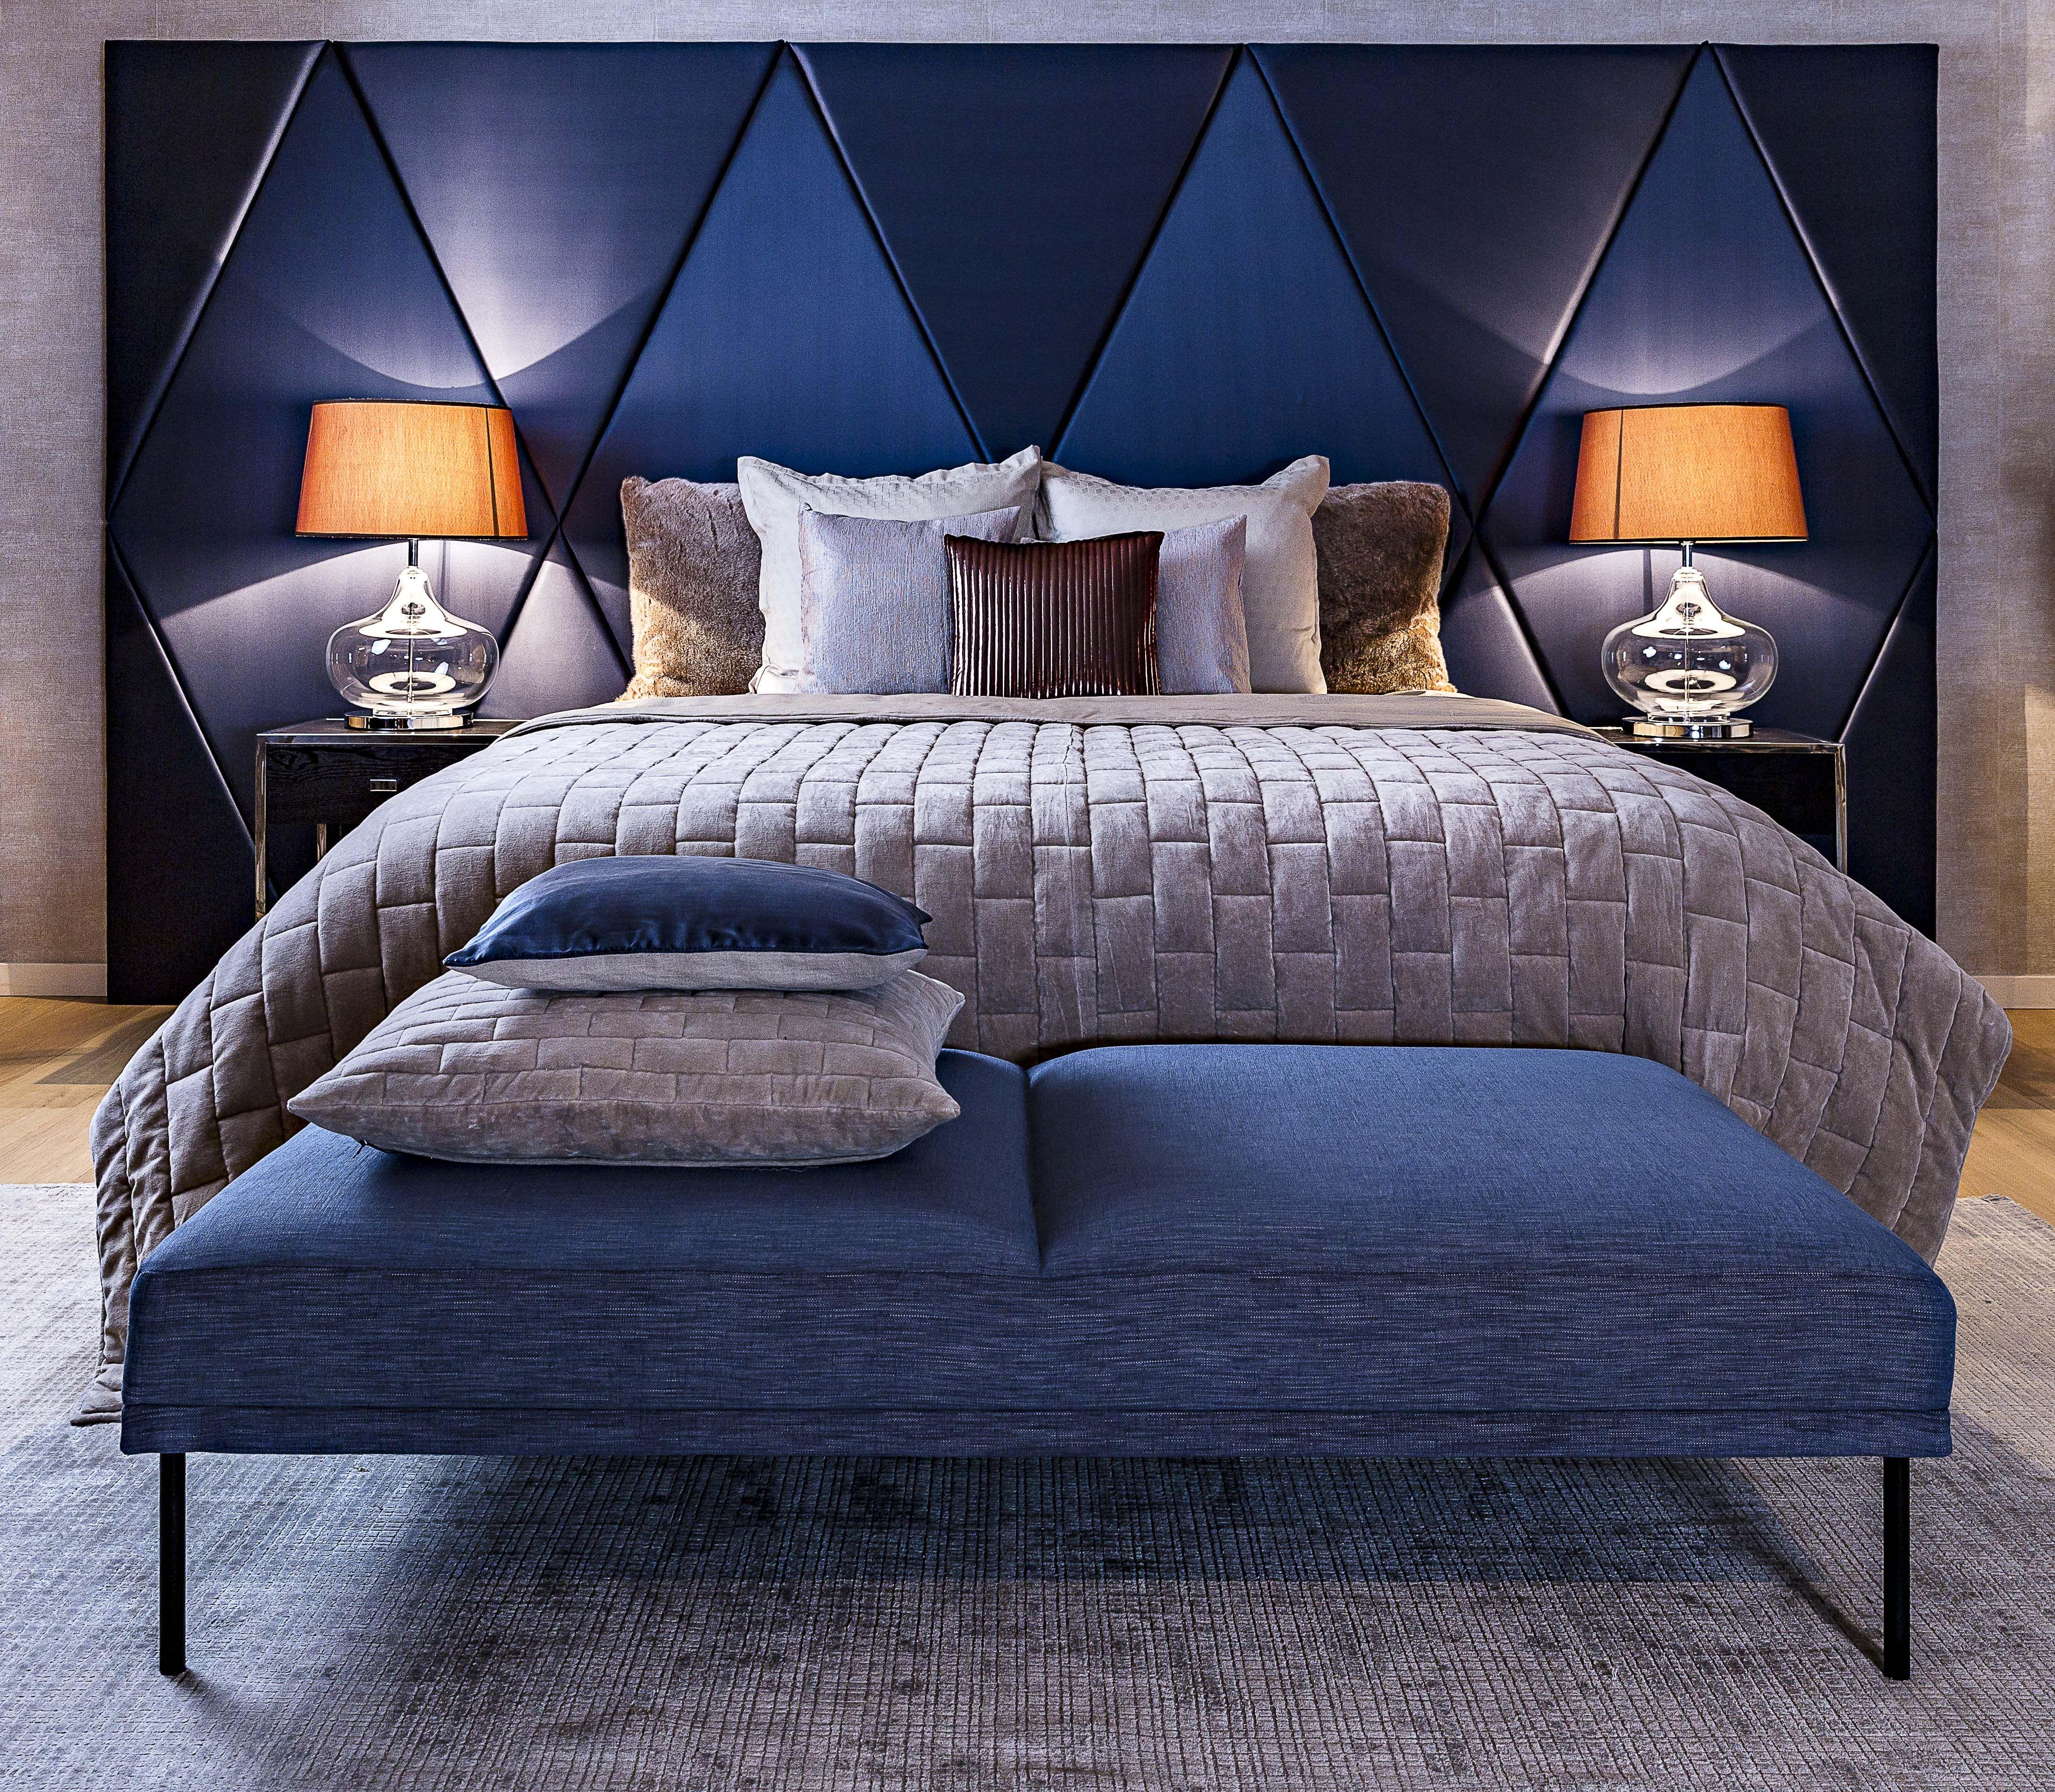 shimmer cosmopolitan living bedroom headboard lighting textiles cushion loft interior decoration funiture dome deco